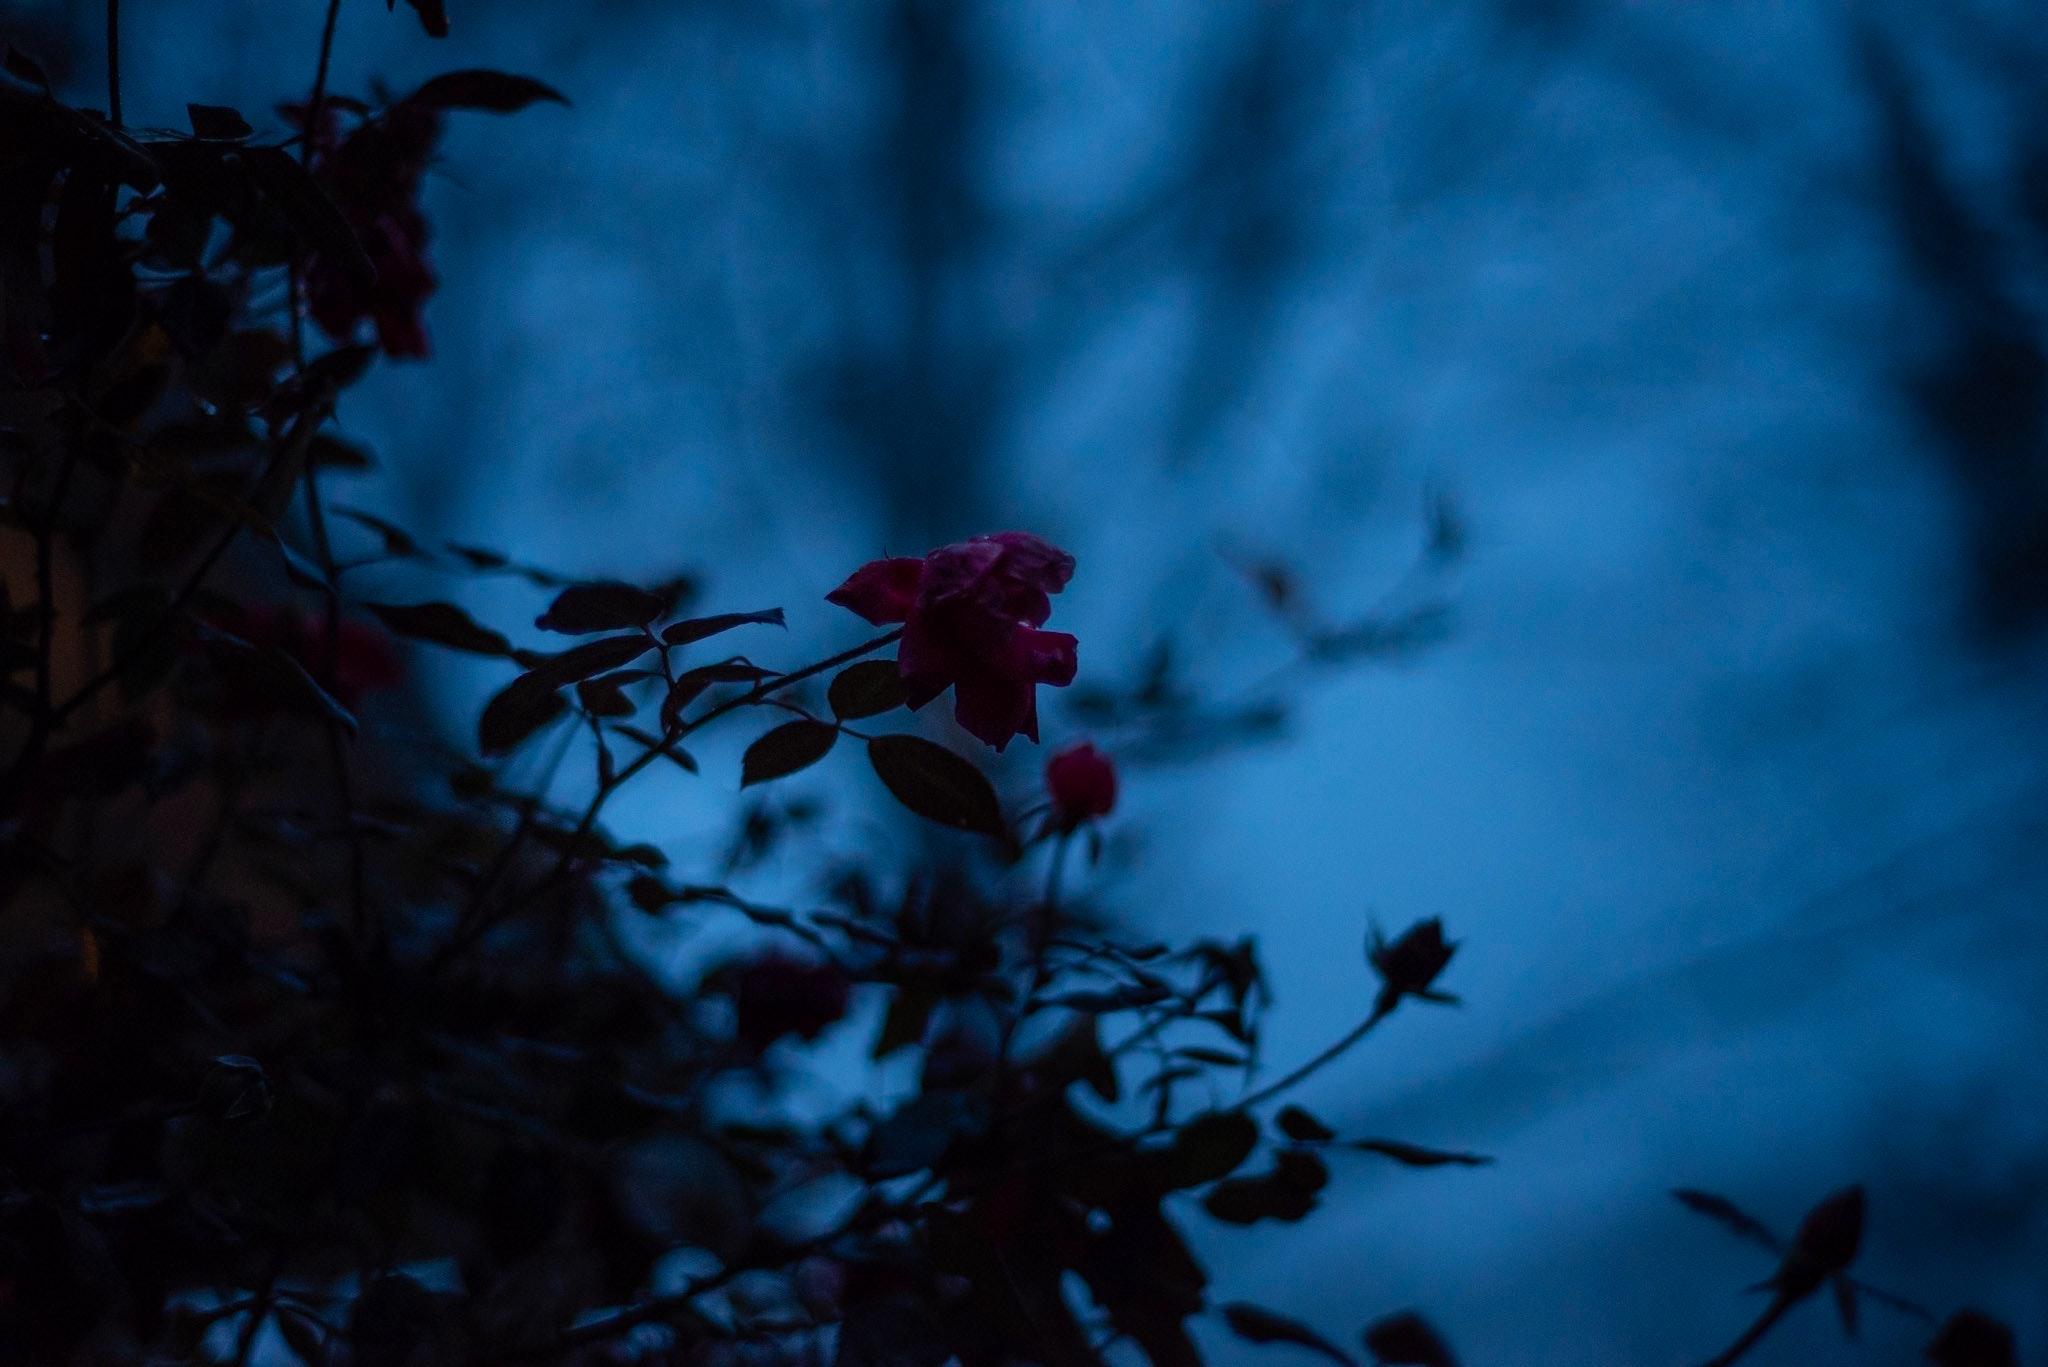 Fae Images - IMG_5063